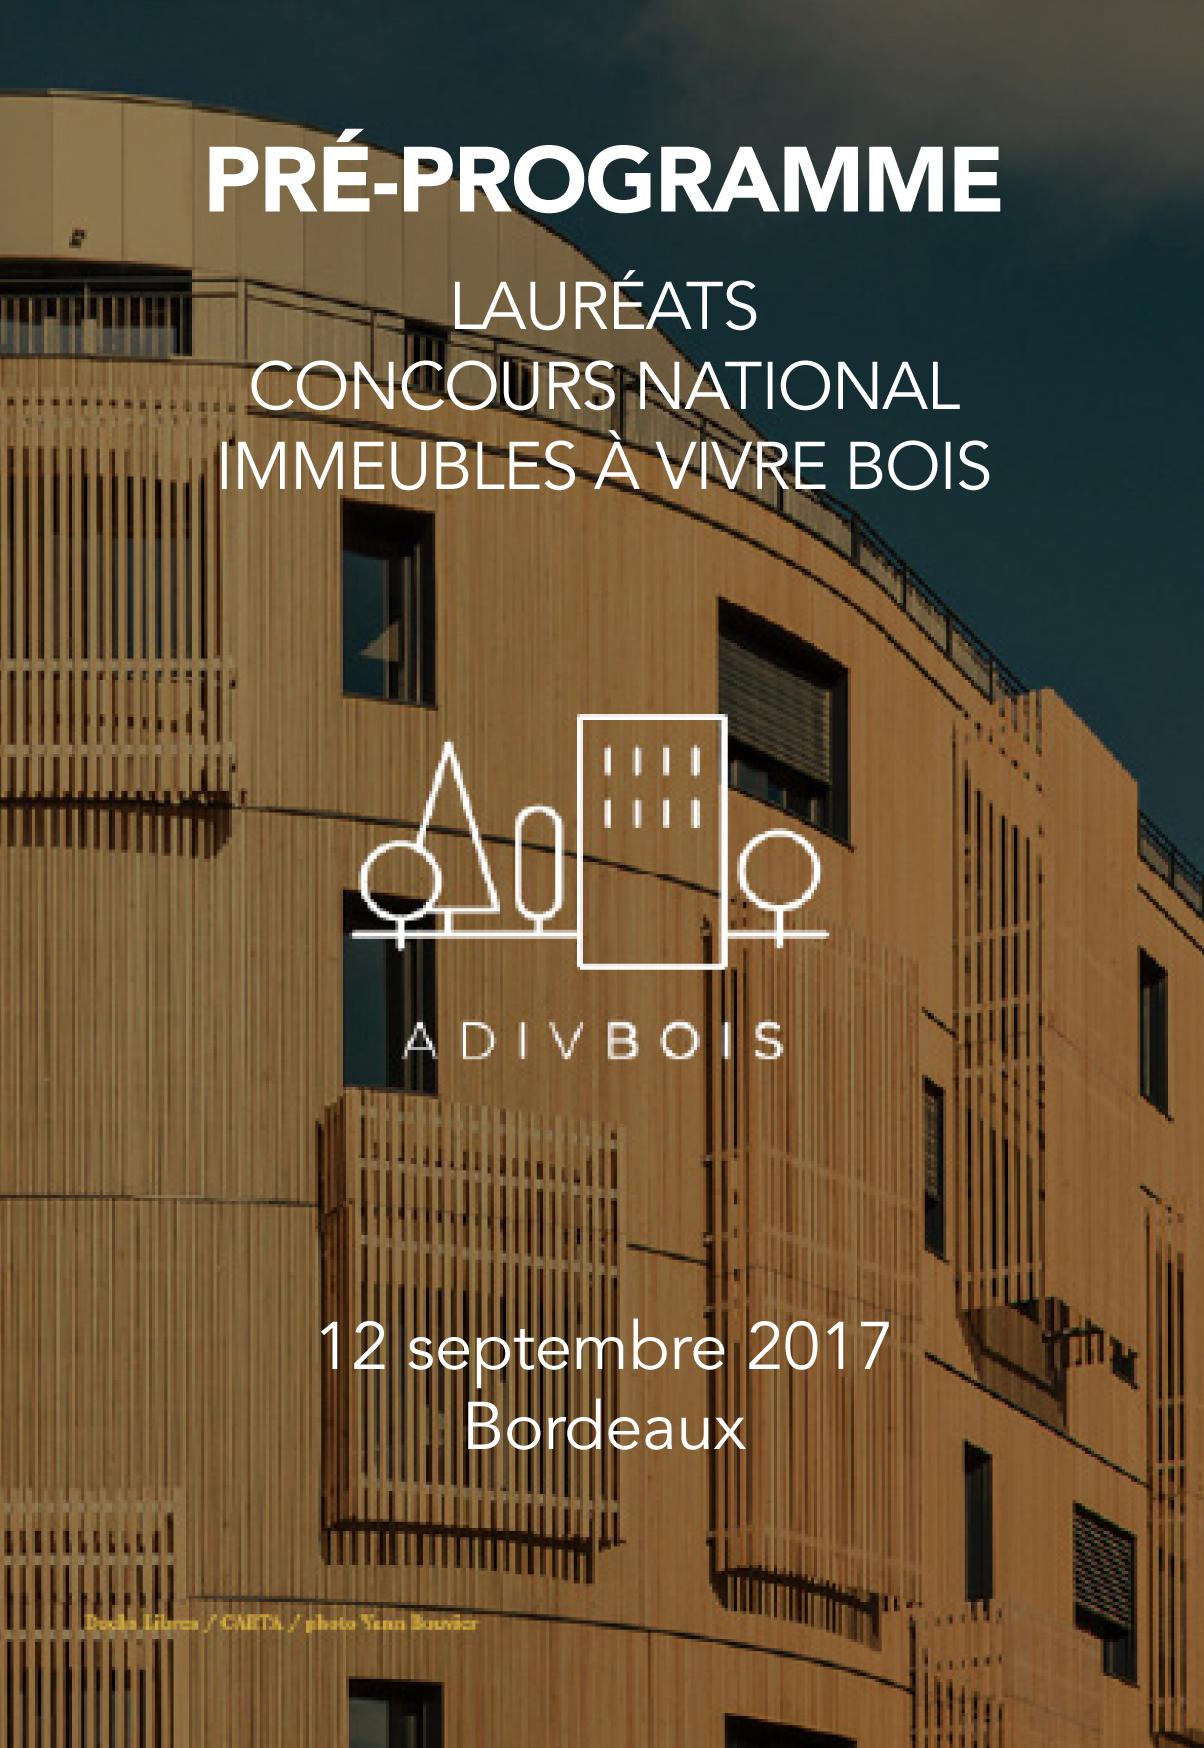 programme_adivbois_120917